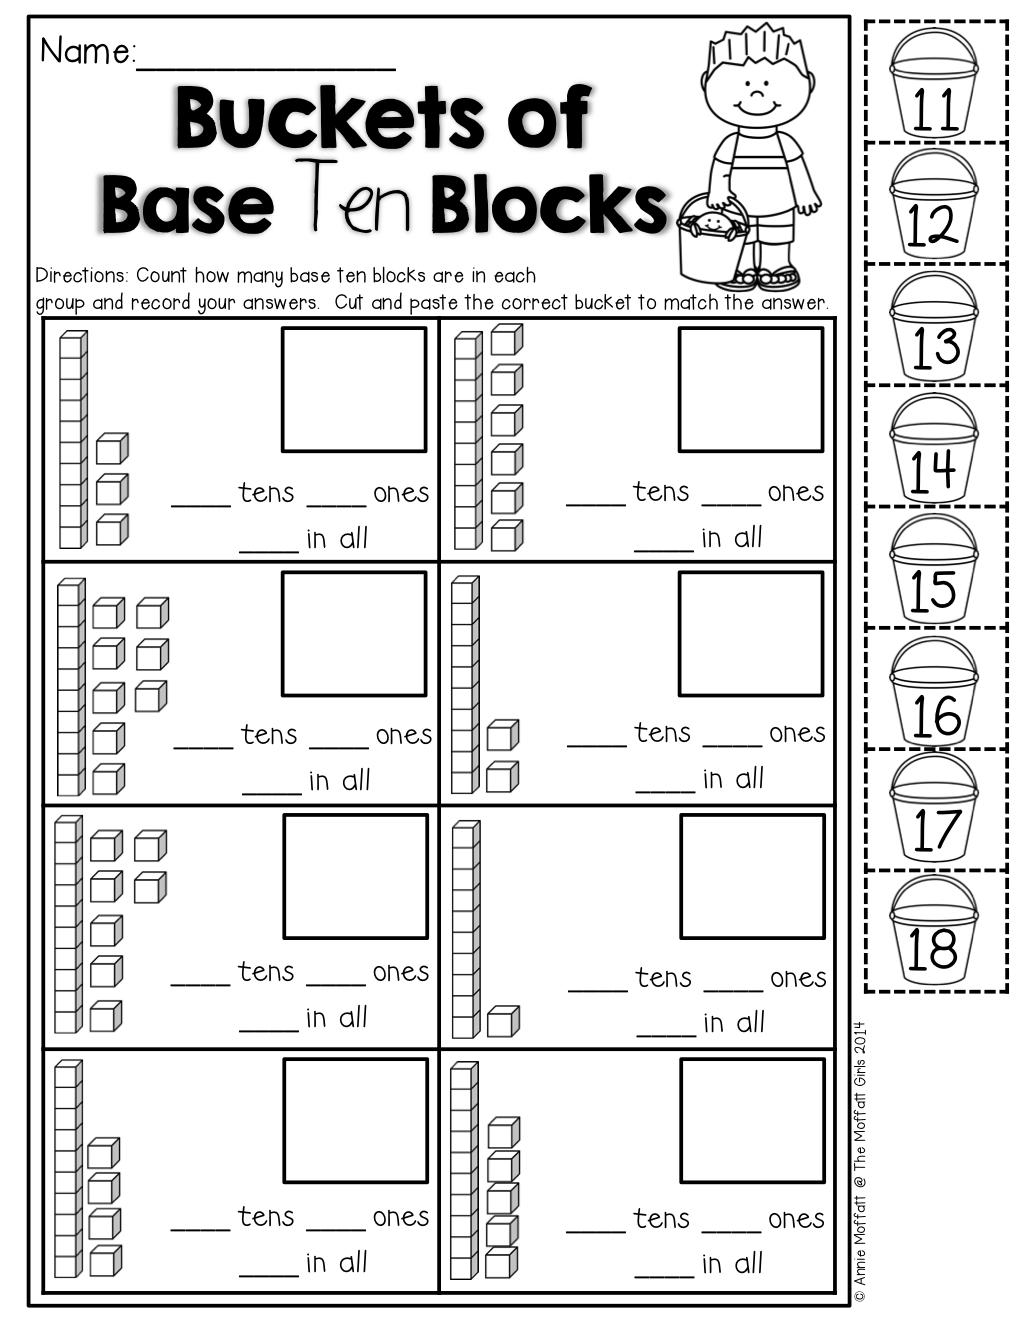 small resolution of https://dubaikhalifas.com/first-grade-math-worksheets-base-10-blocks-k5-learning/